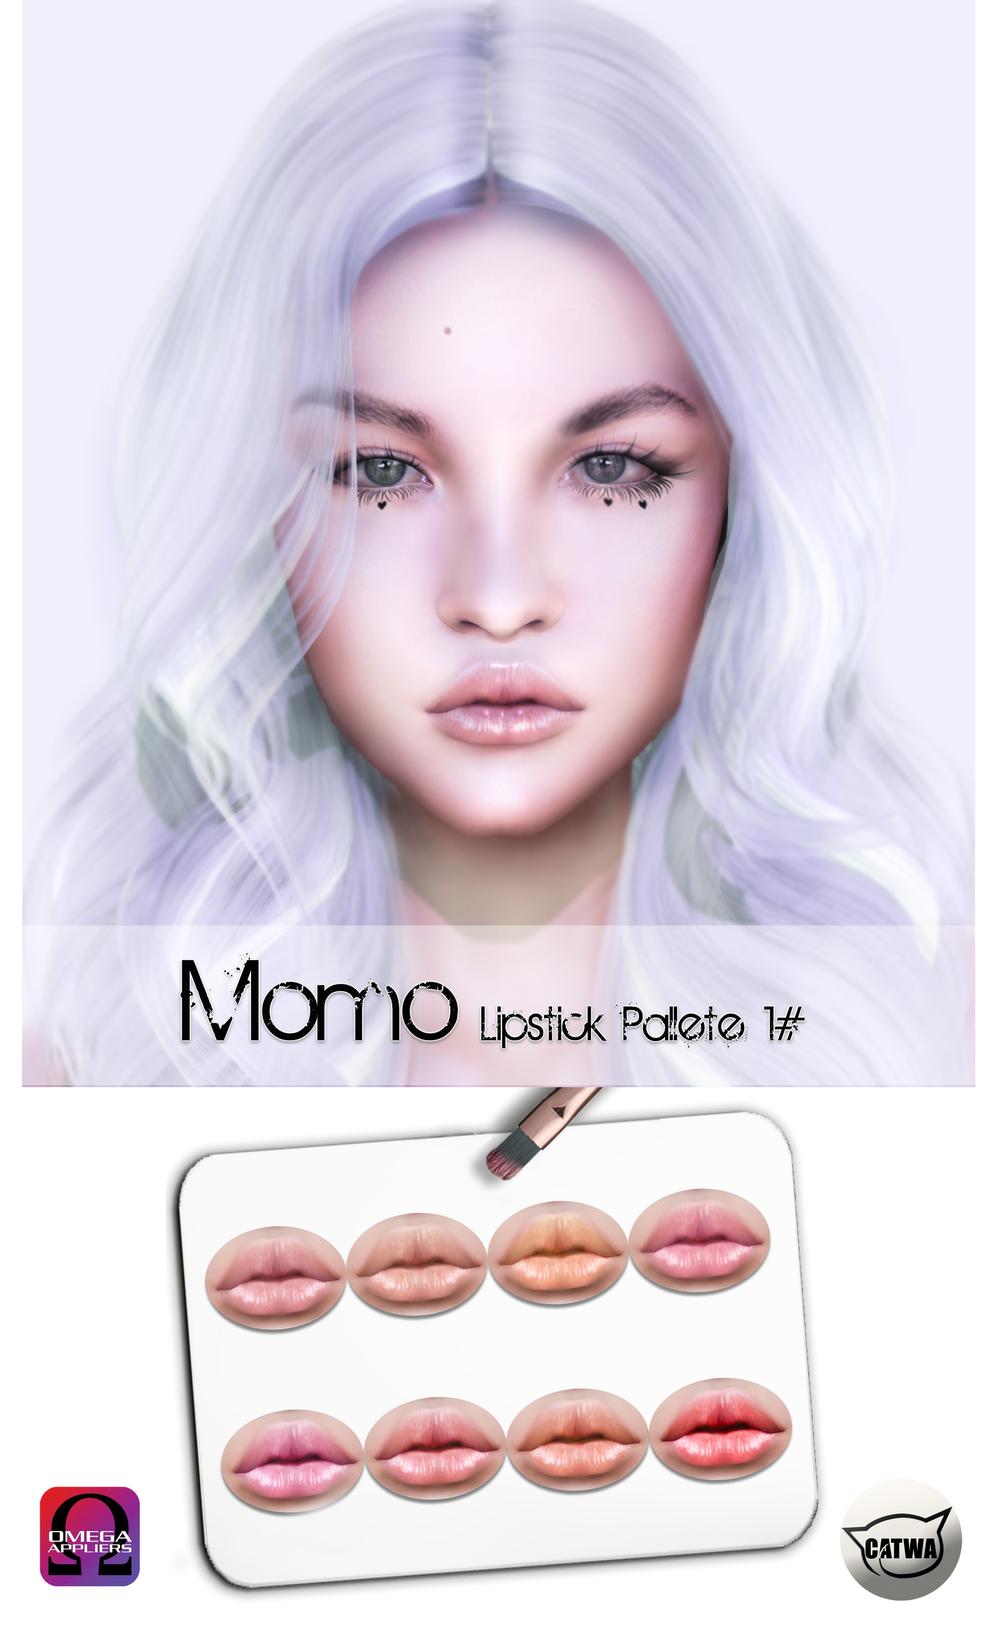 Momo Lipstick Pallete 1# .png